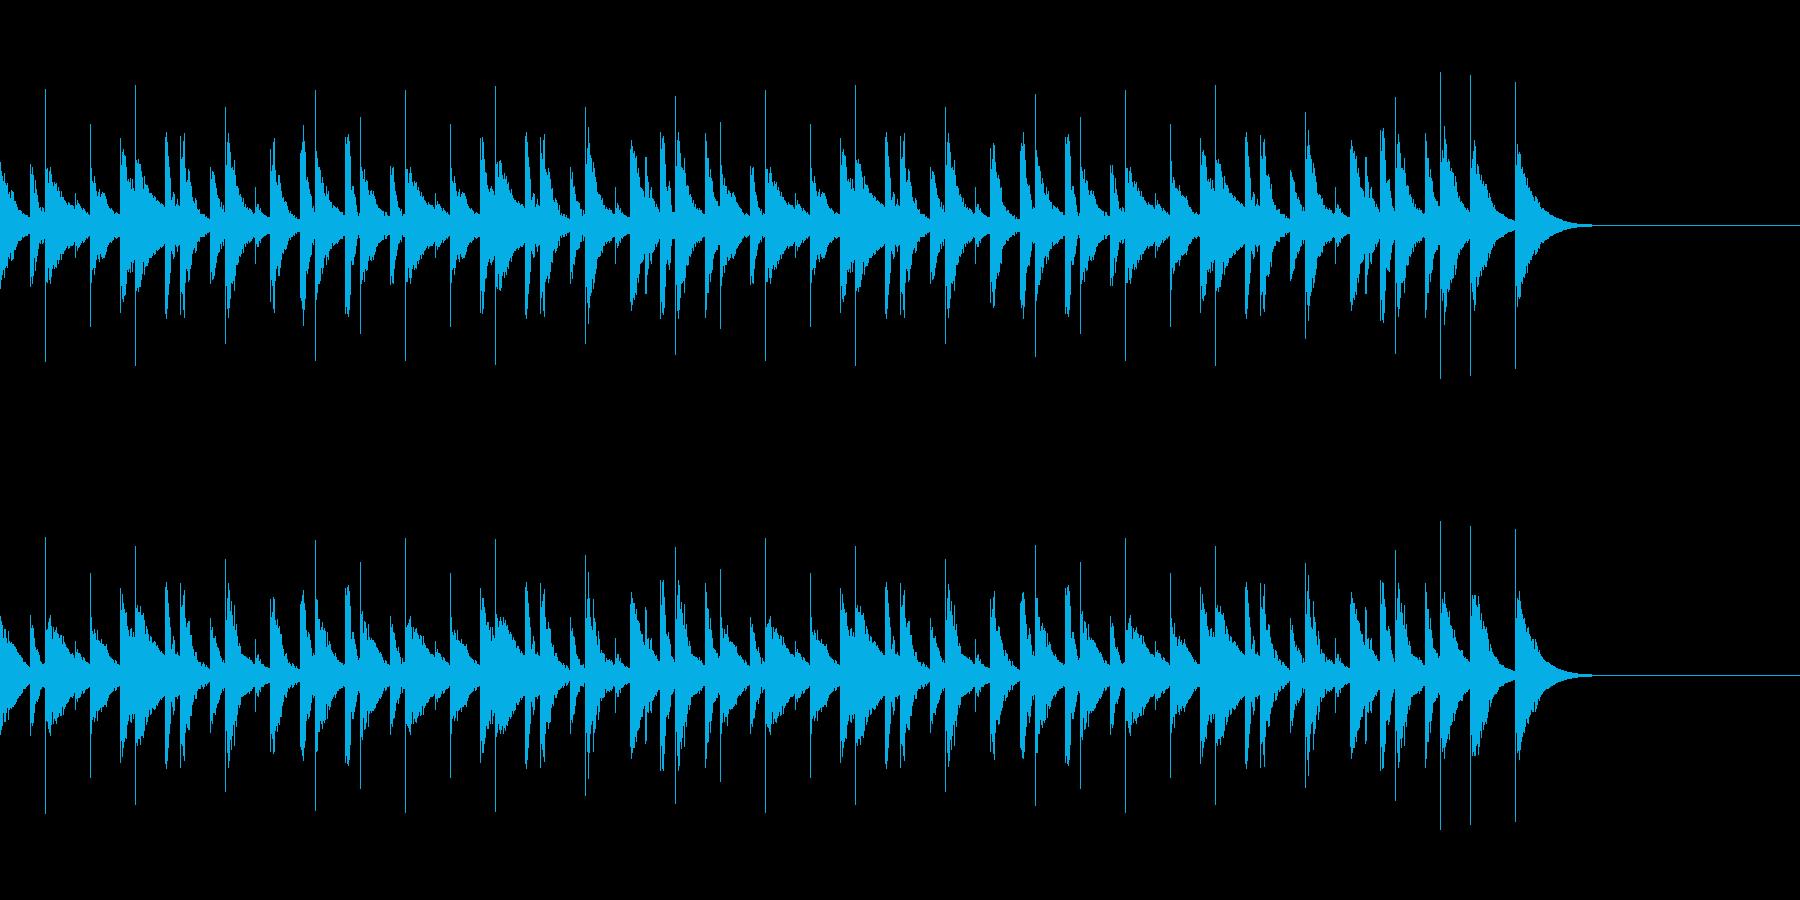 CM 木琴の陽気でコミカルなBGMの再生済みの波形